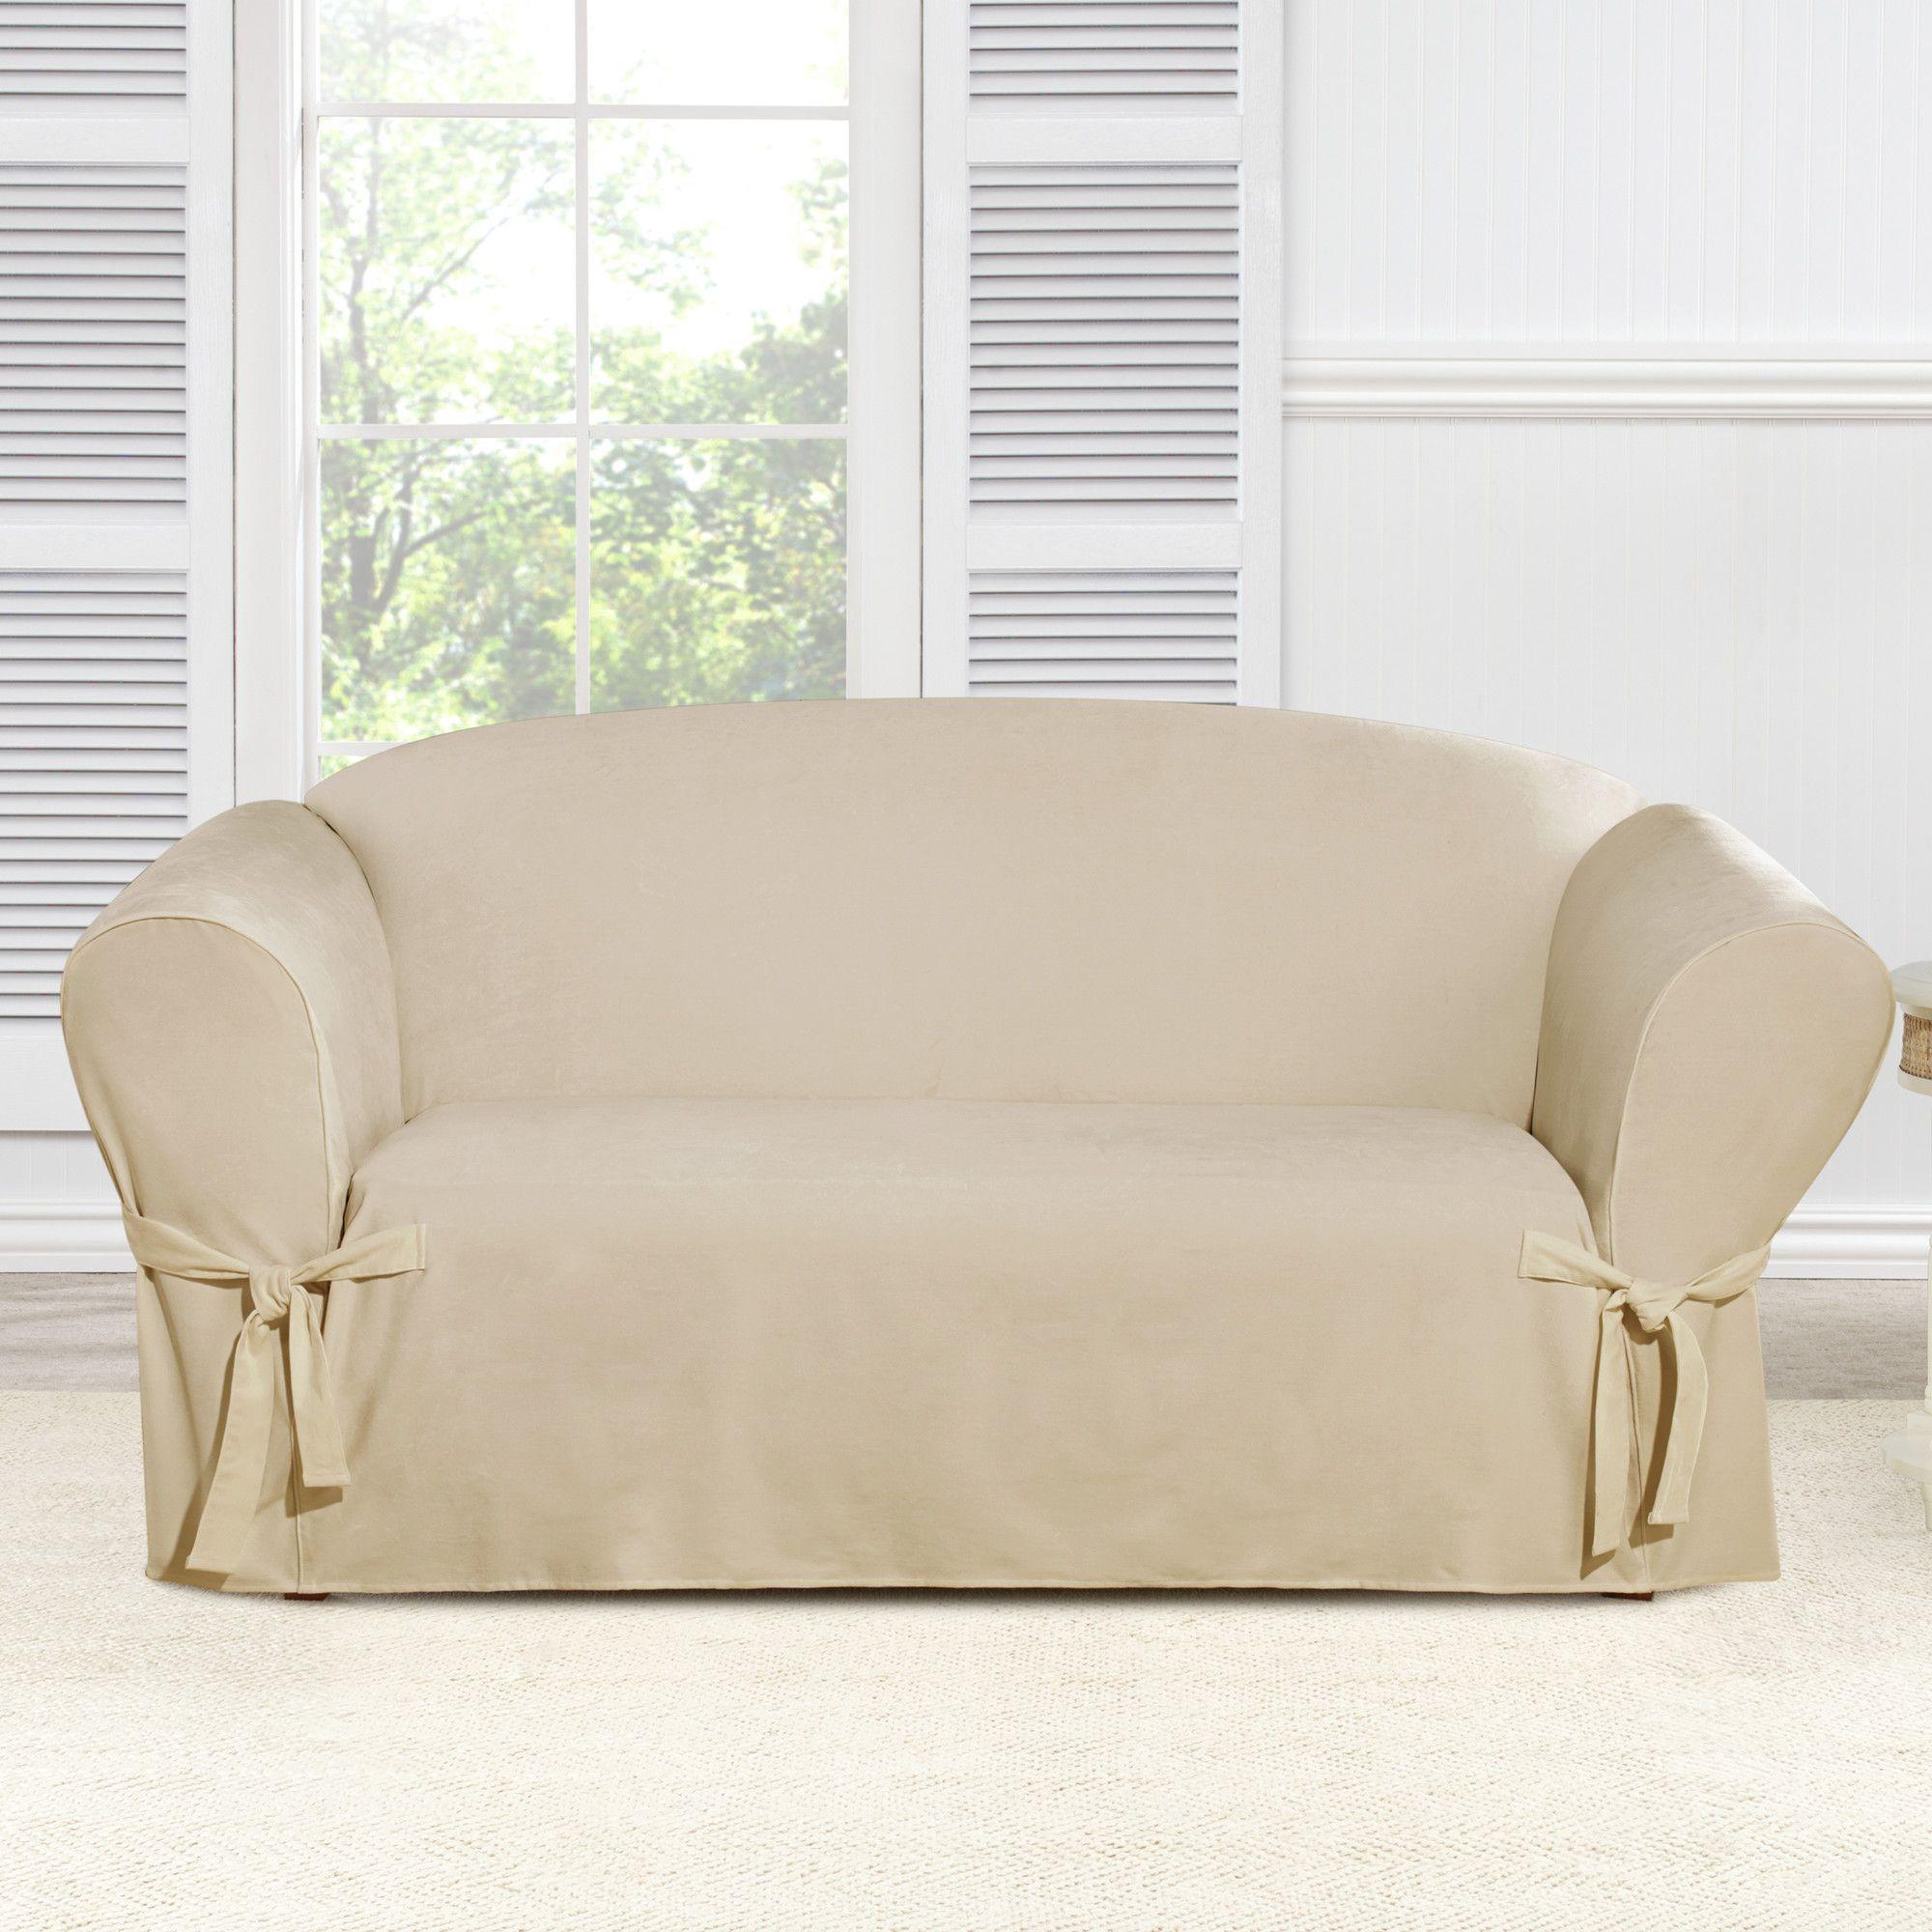 Amazing Everyday Chenille Box Cushion Loveseat Slipcover Products Uwap Interior Chair Design Uwaporg